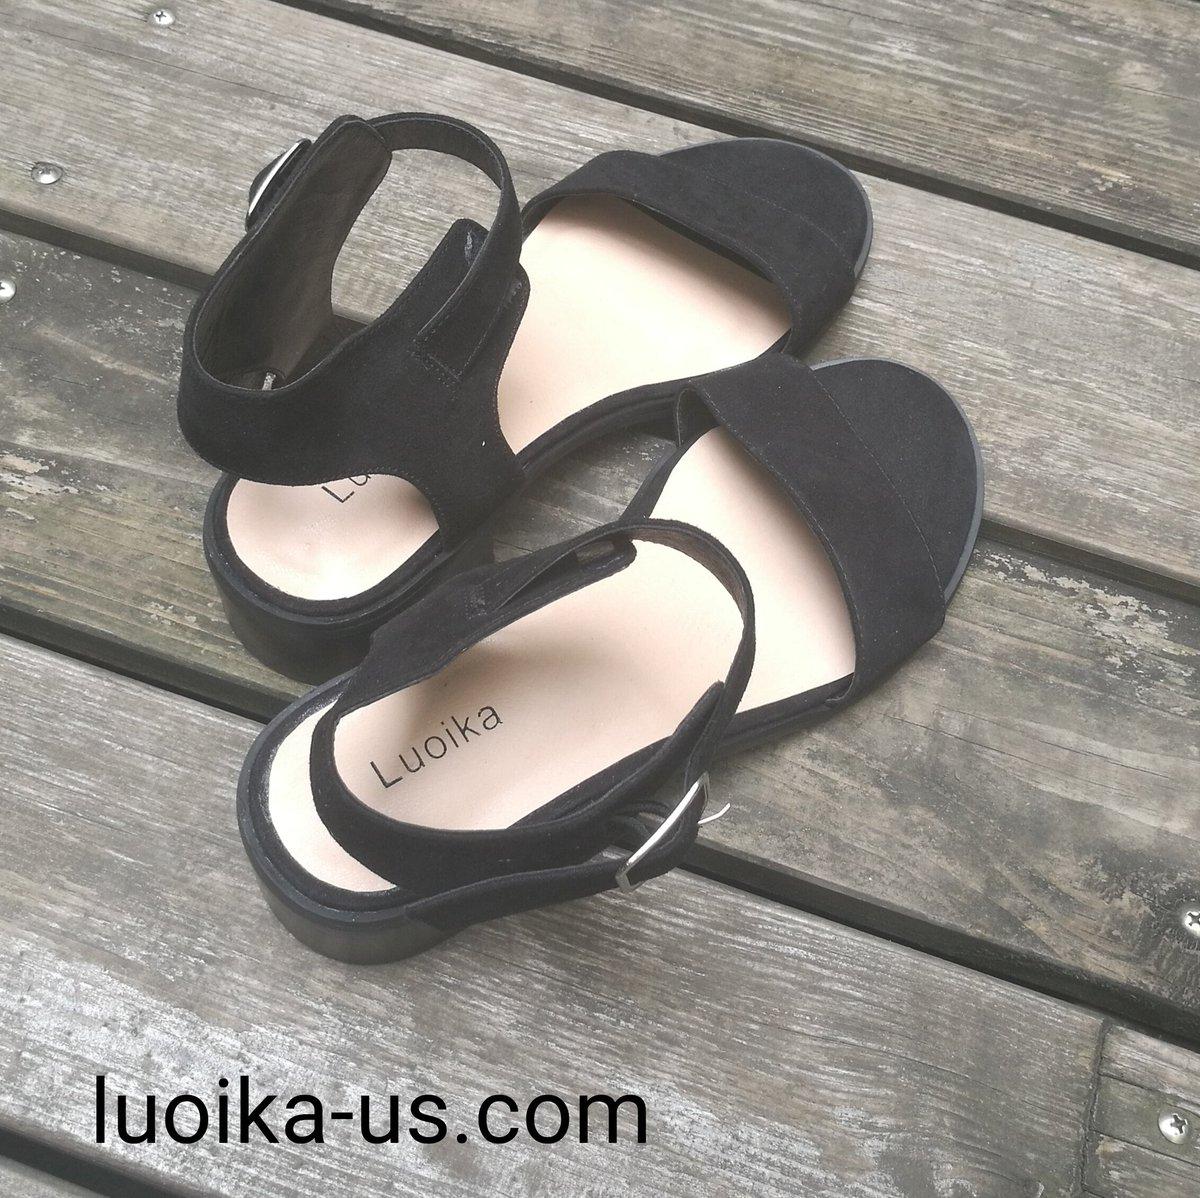 778aa63a1c1f ... Women s Wide Width Heeled Sandals-Classic Low Block Heel Open Toe Ankle  Strap Suede Summer Shoes  plussizeshoes  plussizefashion  widewidthshoes ...